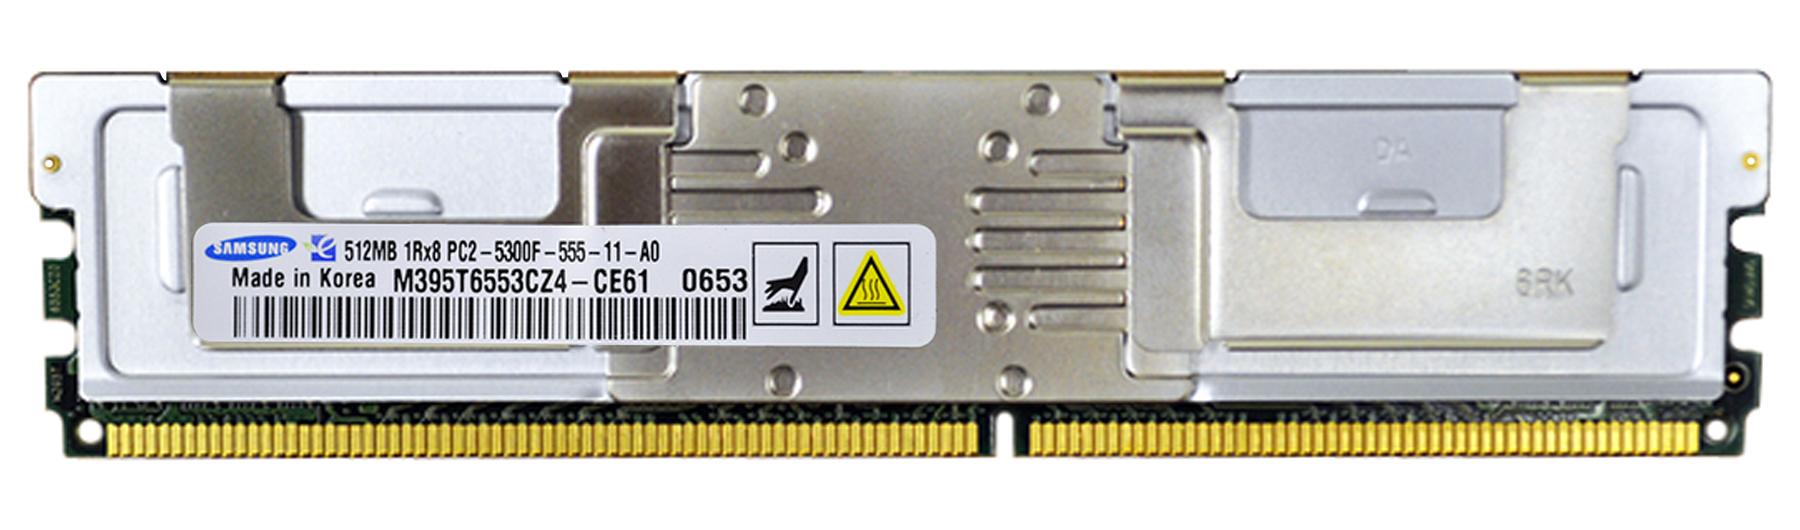 M4L Certified 512MB 667MHz DDR2 PC2-5300 Fully Buffered ECC CL5 240-Pin Single Rank x8 DIMM Mfr P/N M4L-PC2667ED2S85FD-512M